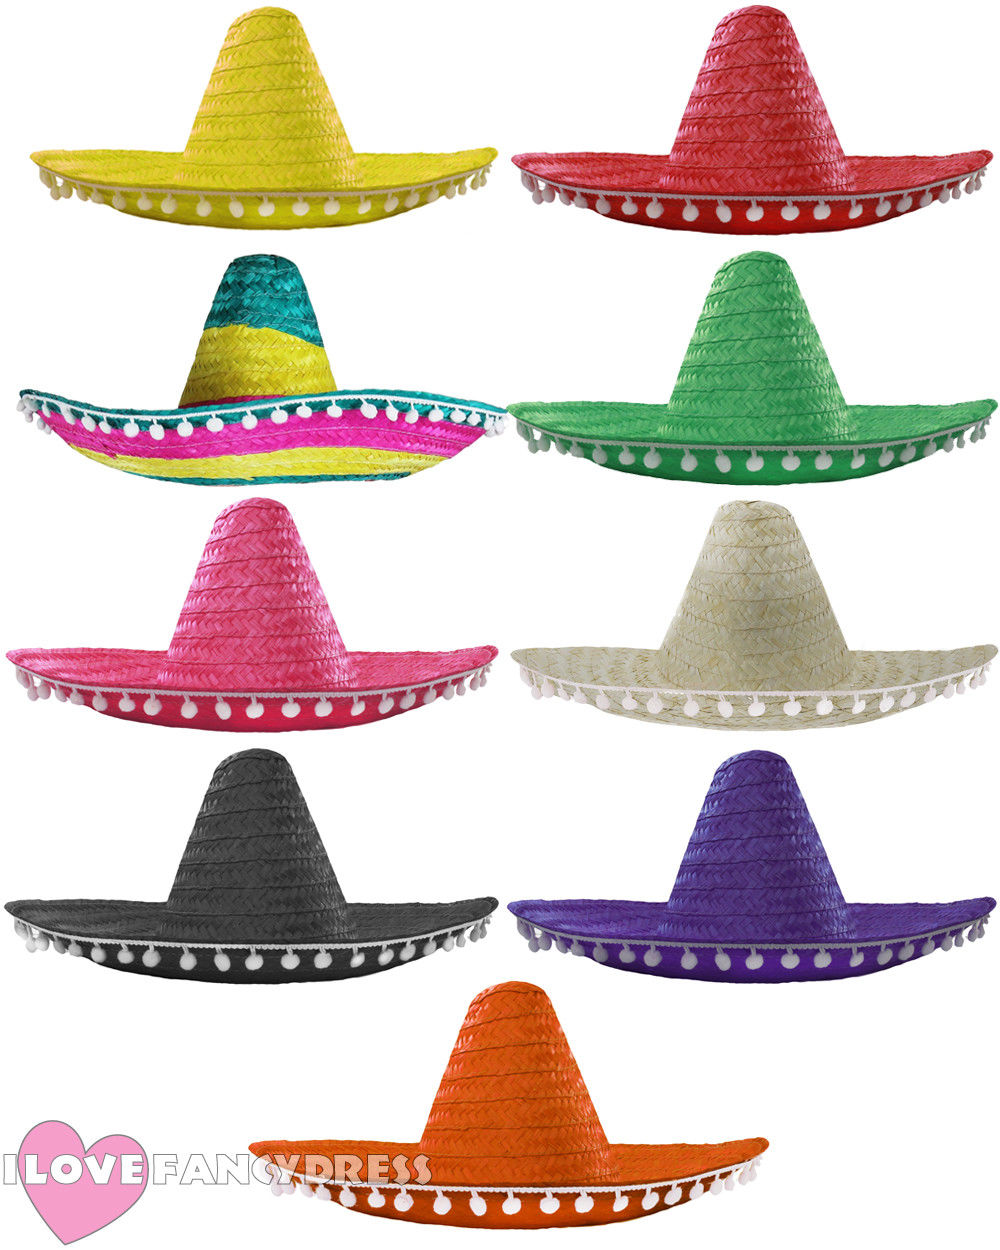 I LOVE FANCY DRESS MEXICAN SOMBRERO STRAW HAT ADD MOUSTACHE CIGAR BANDIT FANCY DRESS HALLOWEEN COSTUME COCO DAY OF THE DEAD